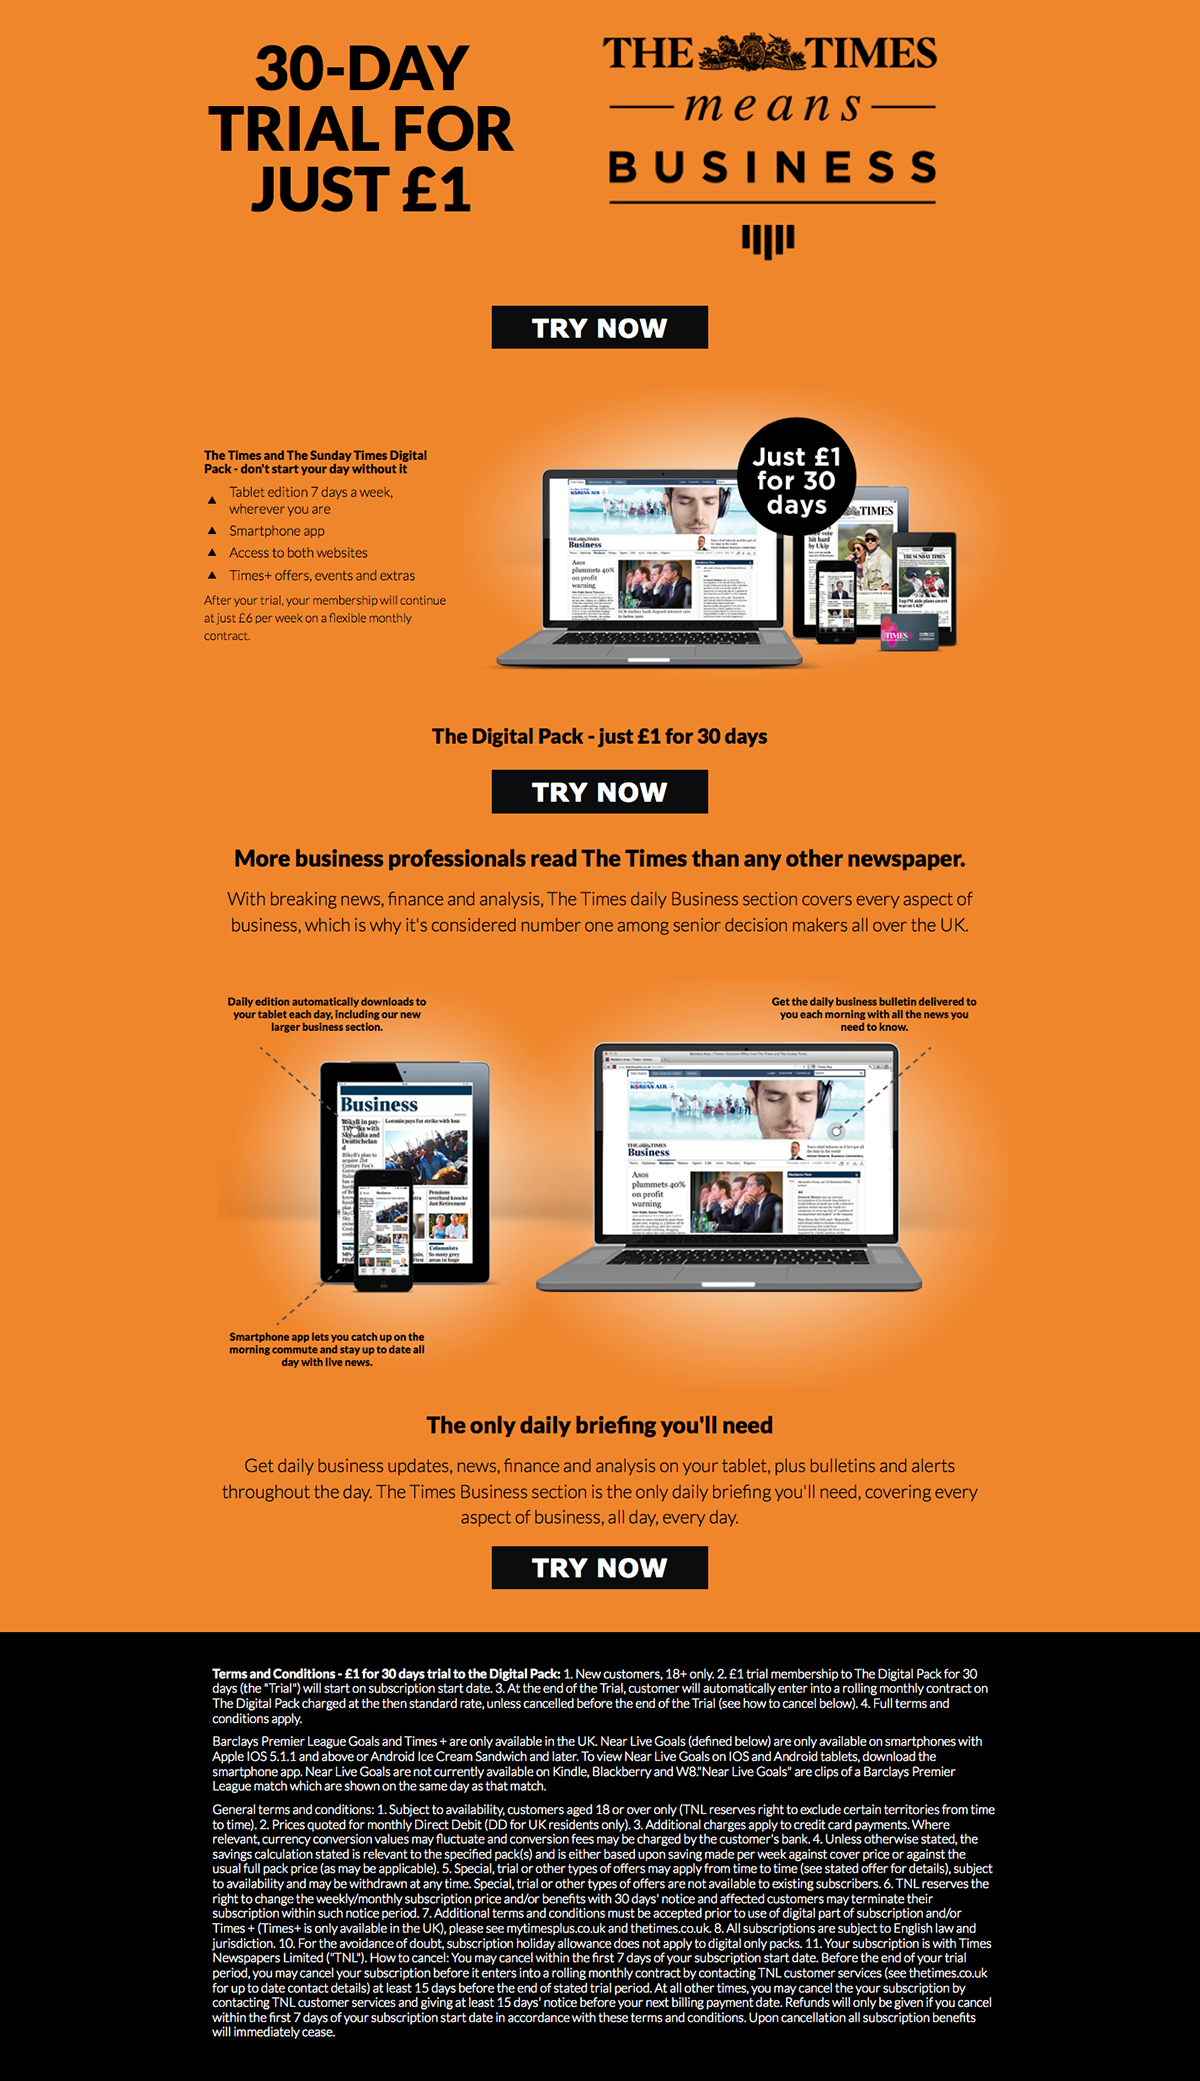 bootstrap 3 Responsive Design Handcoding html5 css web fonts JavaScript